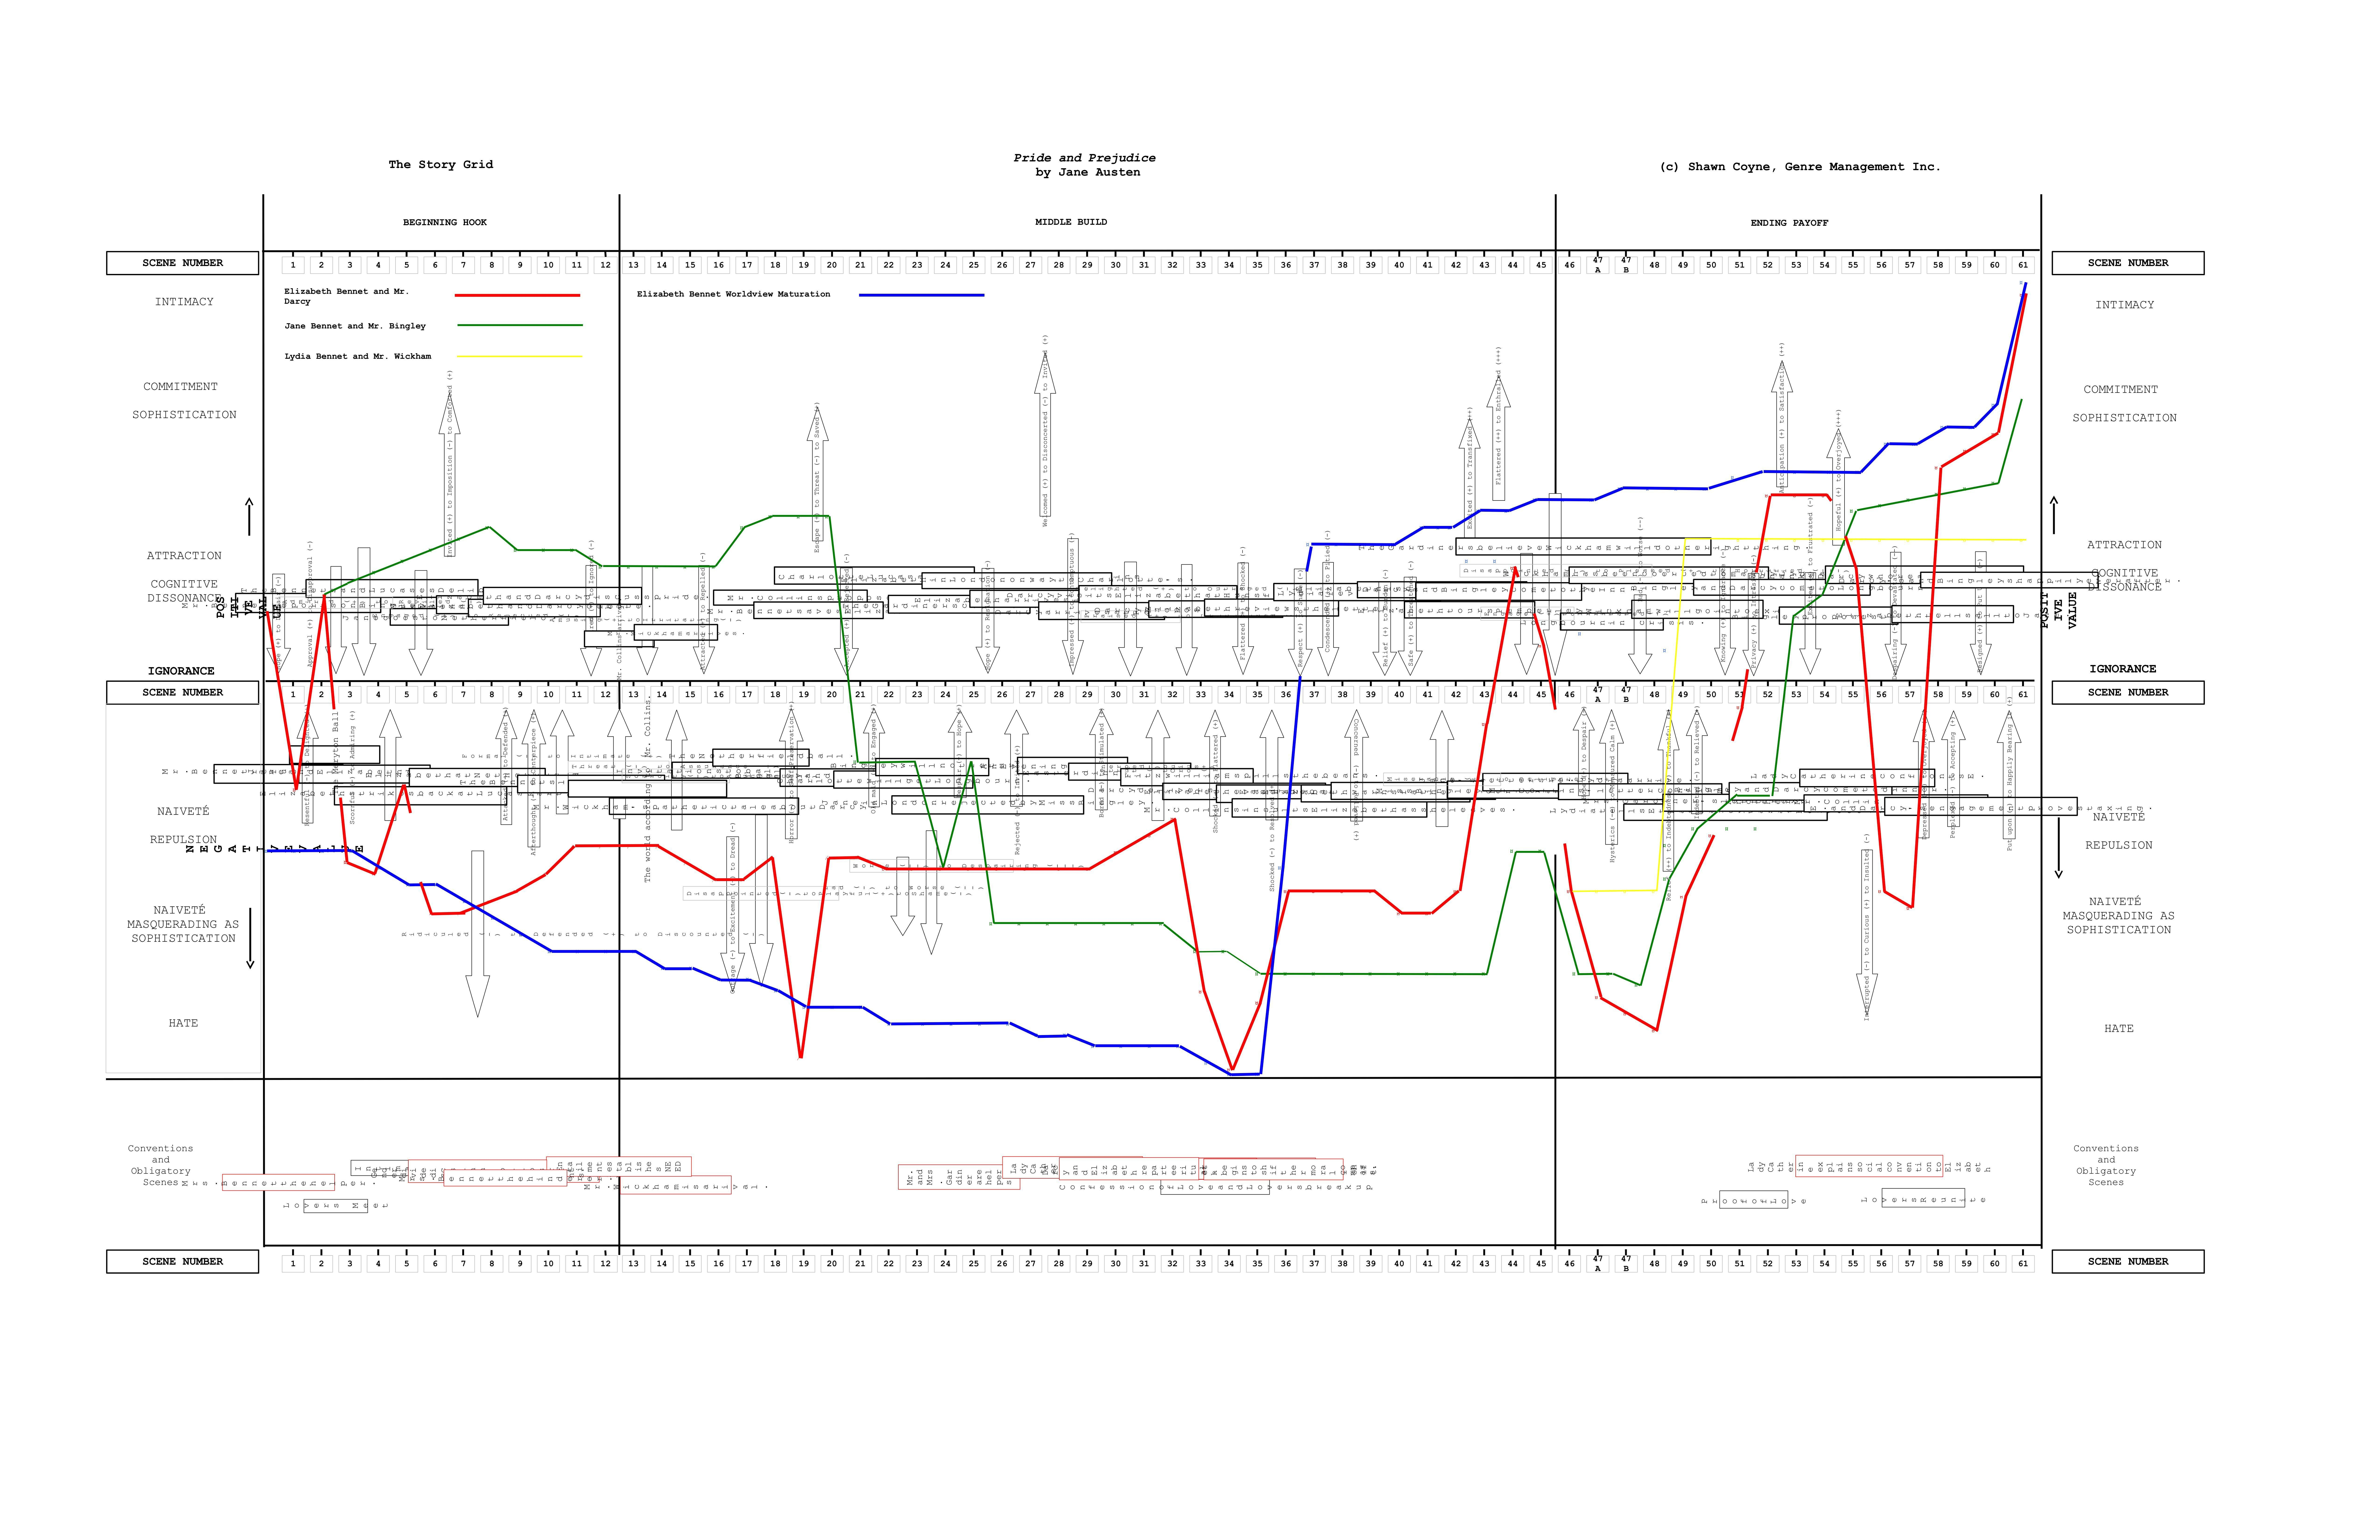 Plot Diagram Of Pride And Prejudice 5 Way Round Trailer Plug Wiring Editor Shawn Coyne S Story Grid For Jane Austen